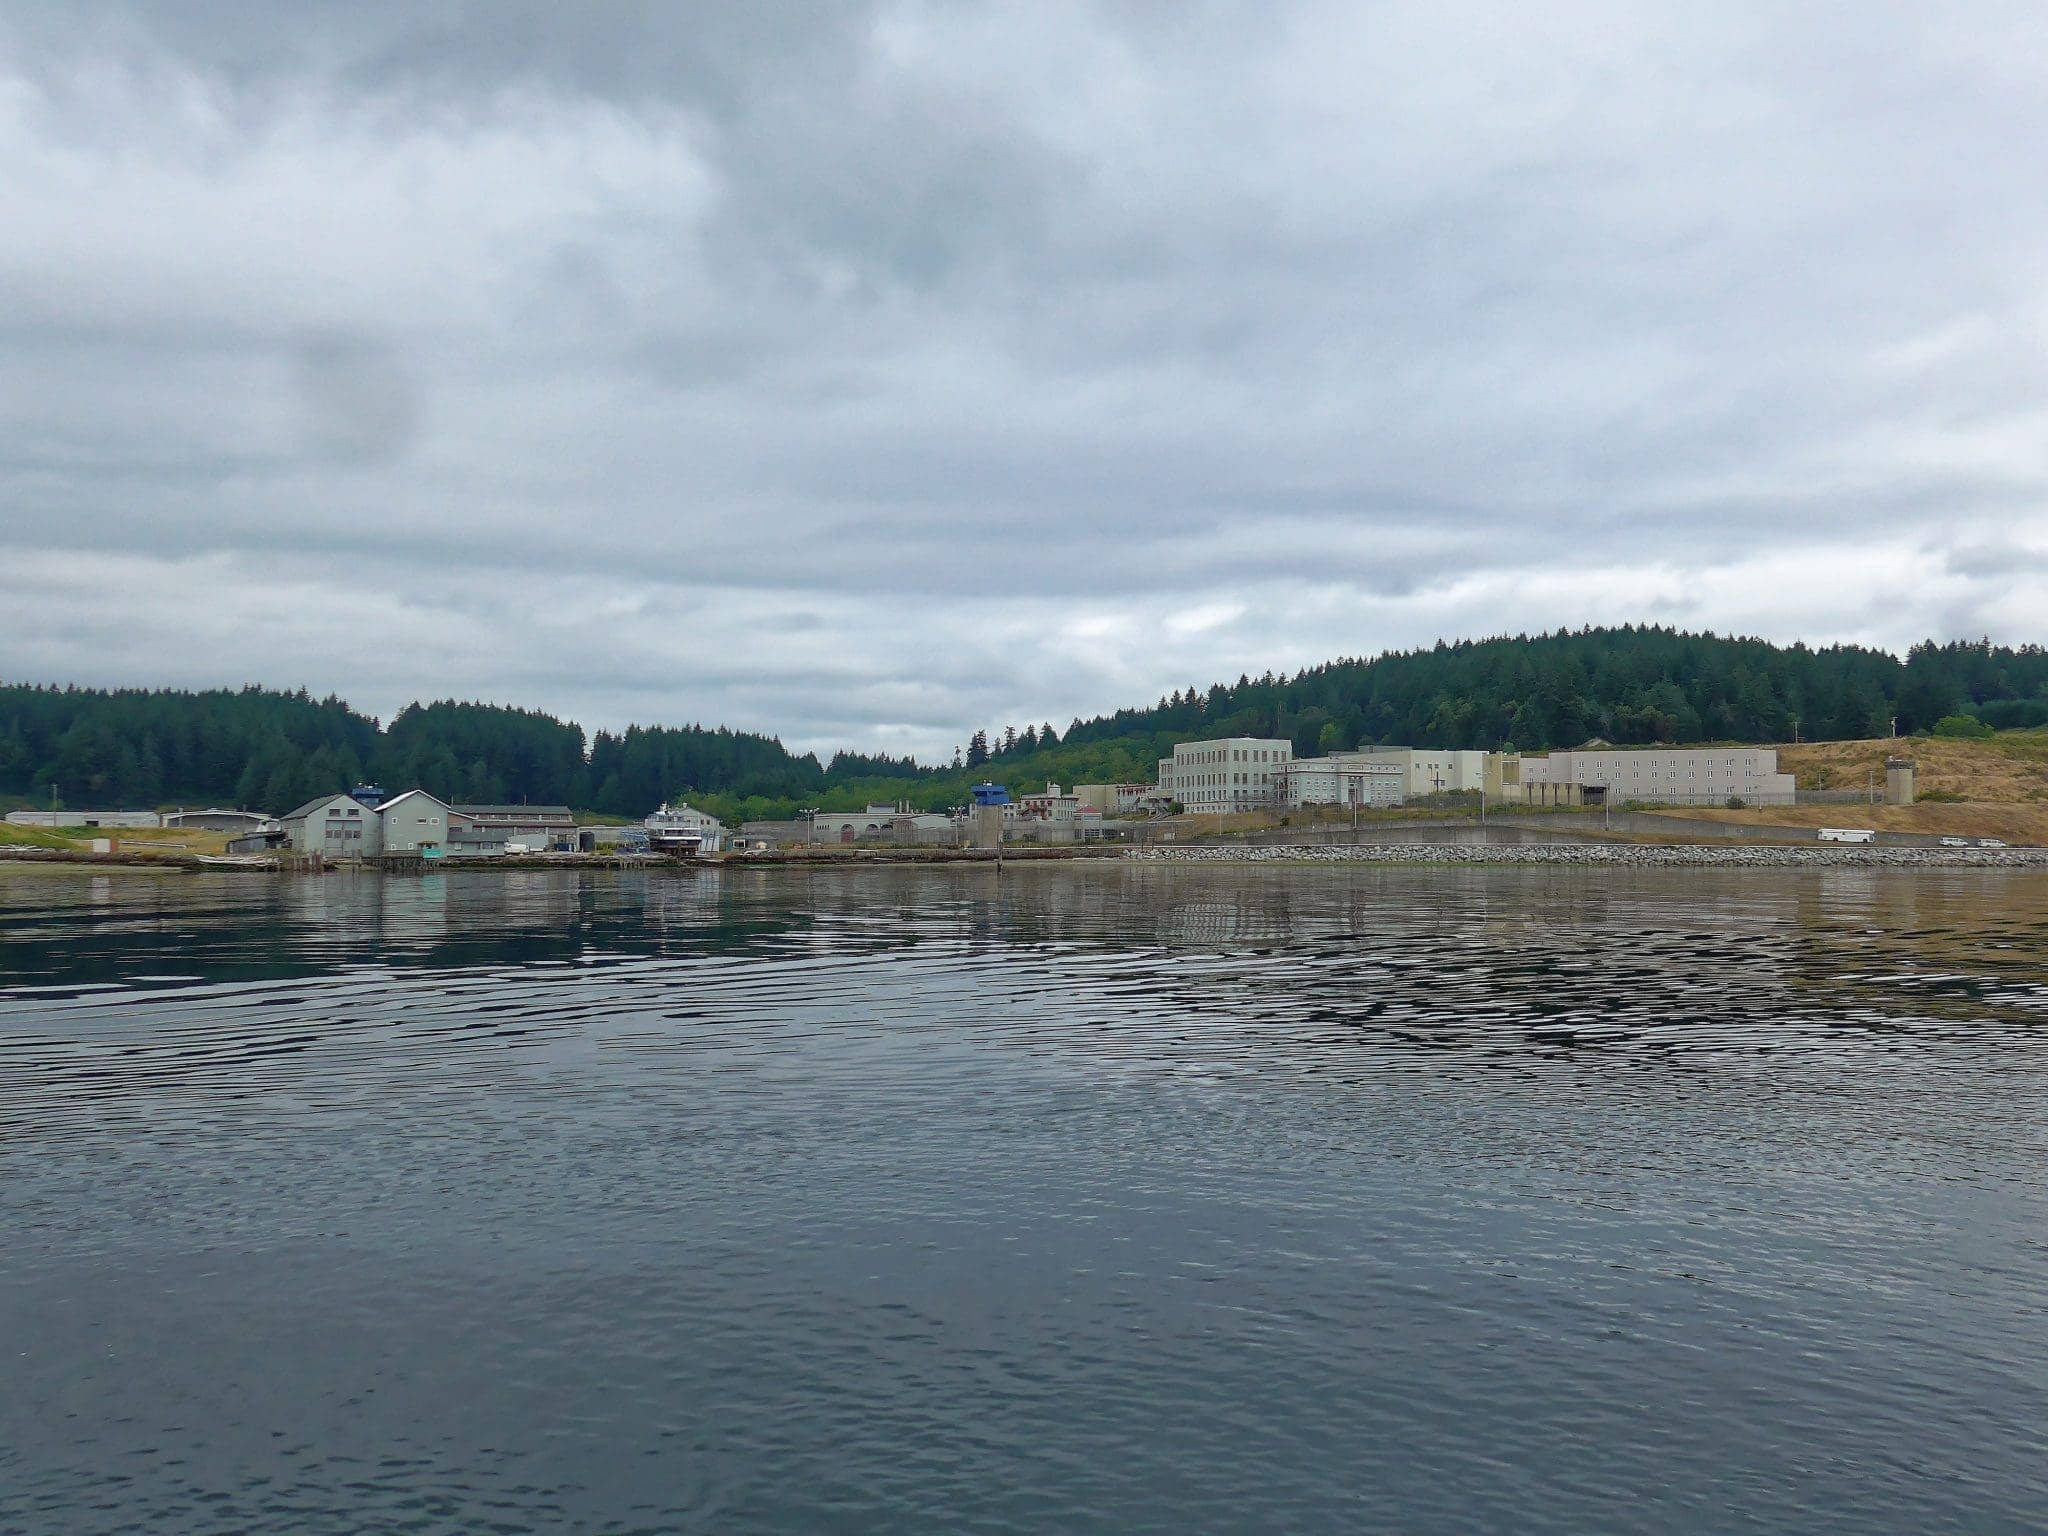 McNeil Island prison